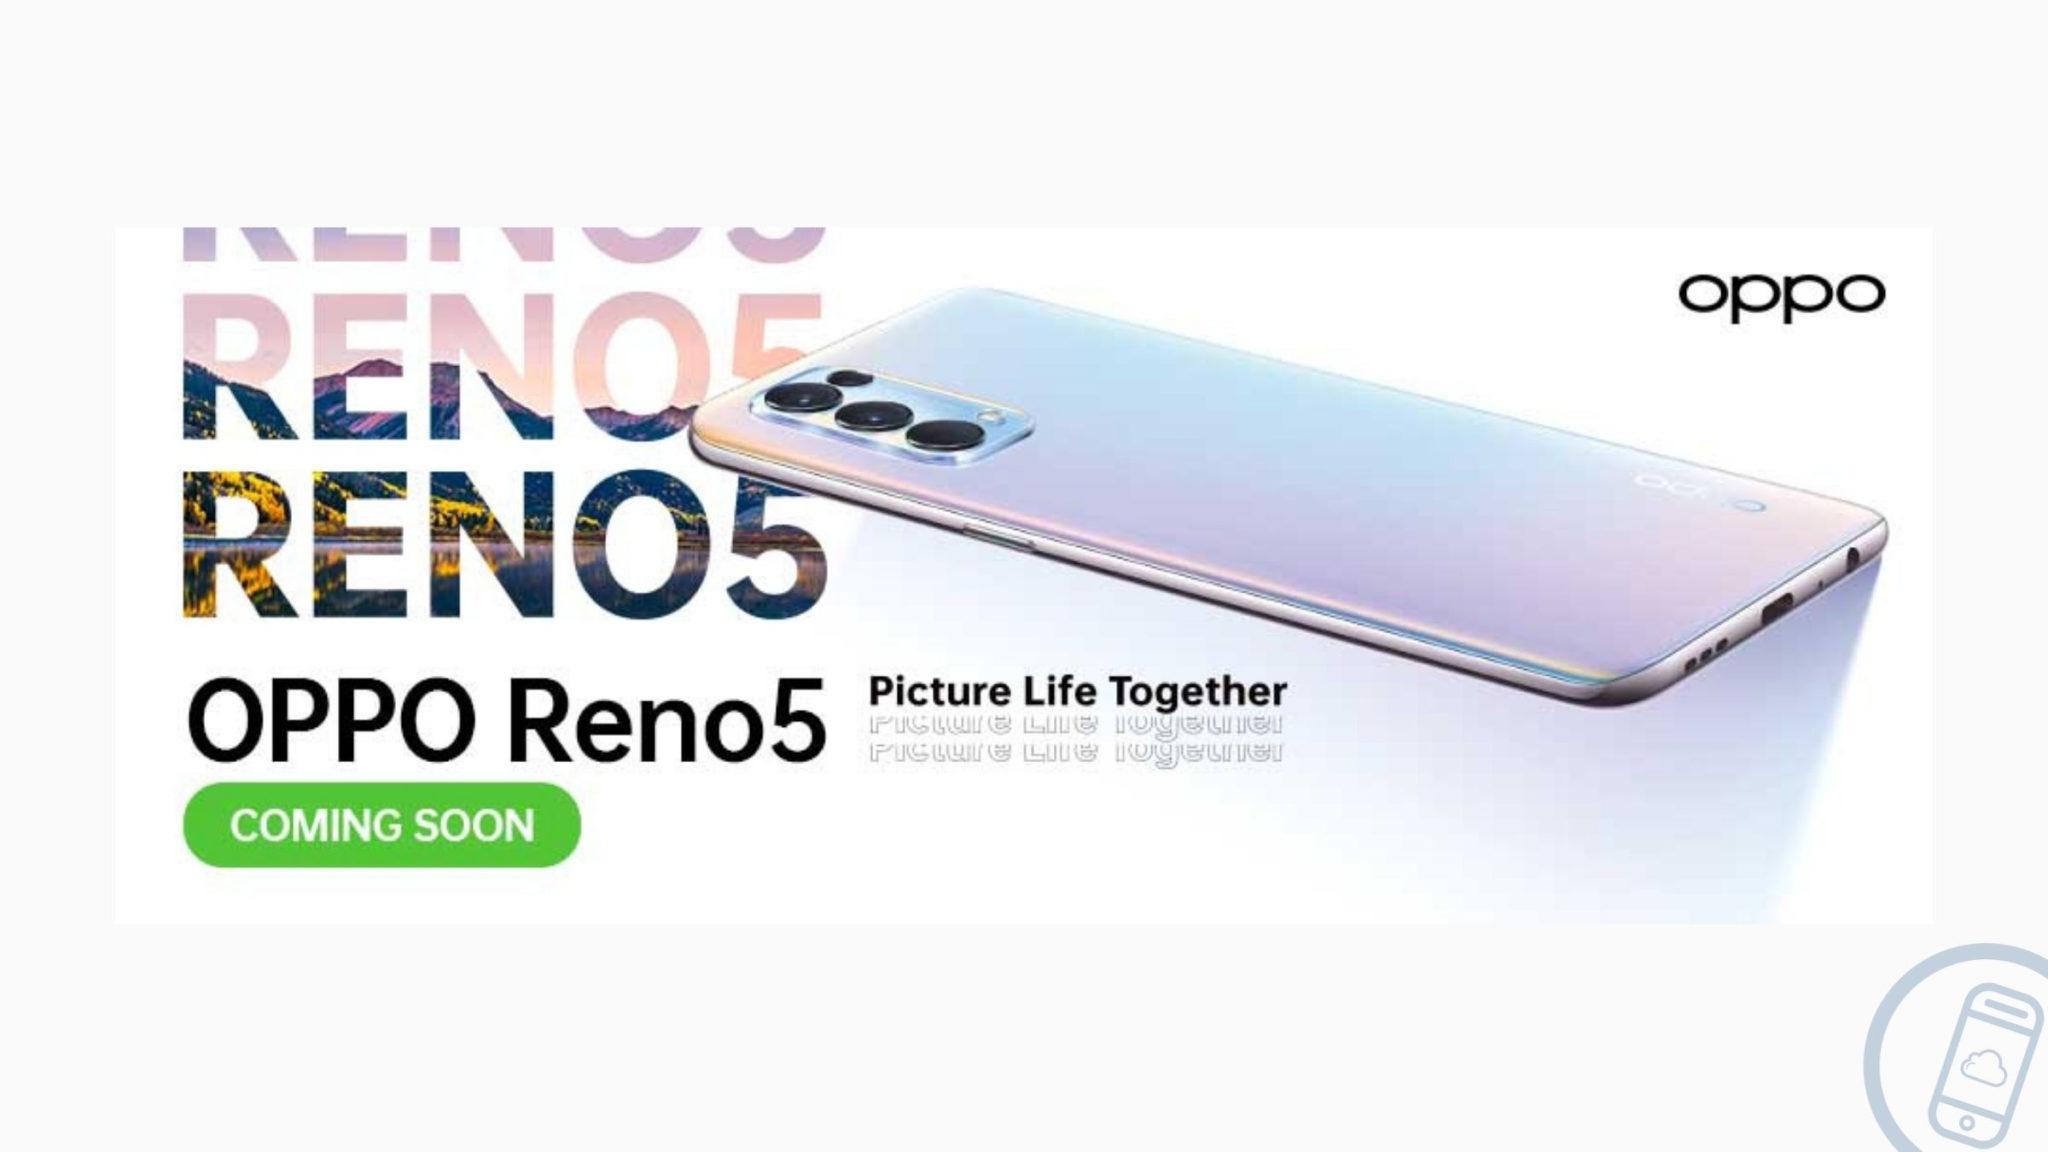 OPPO Reno5 Arriving in February 2021 Header